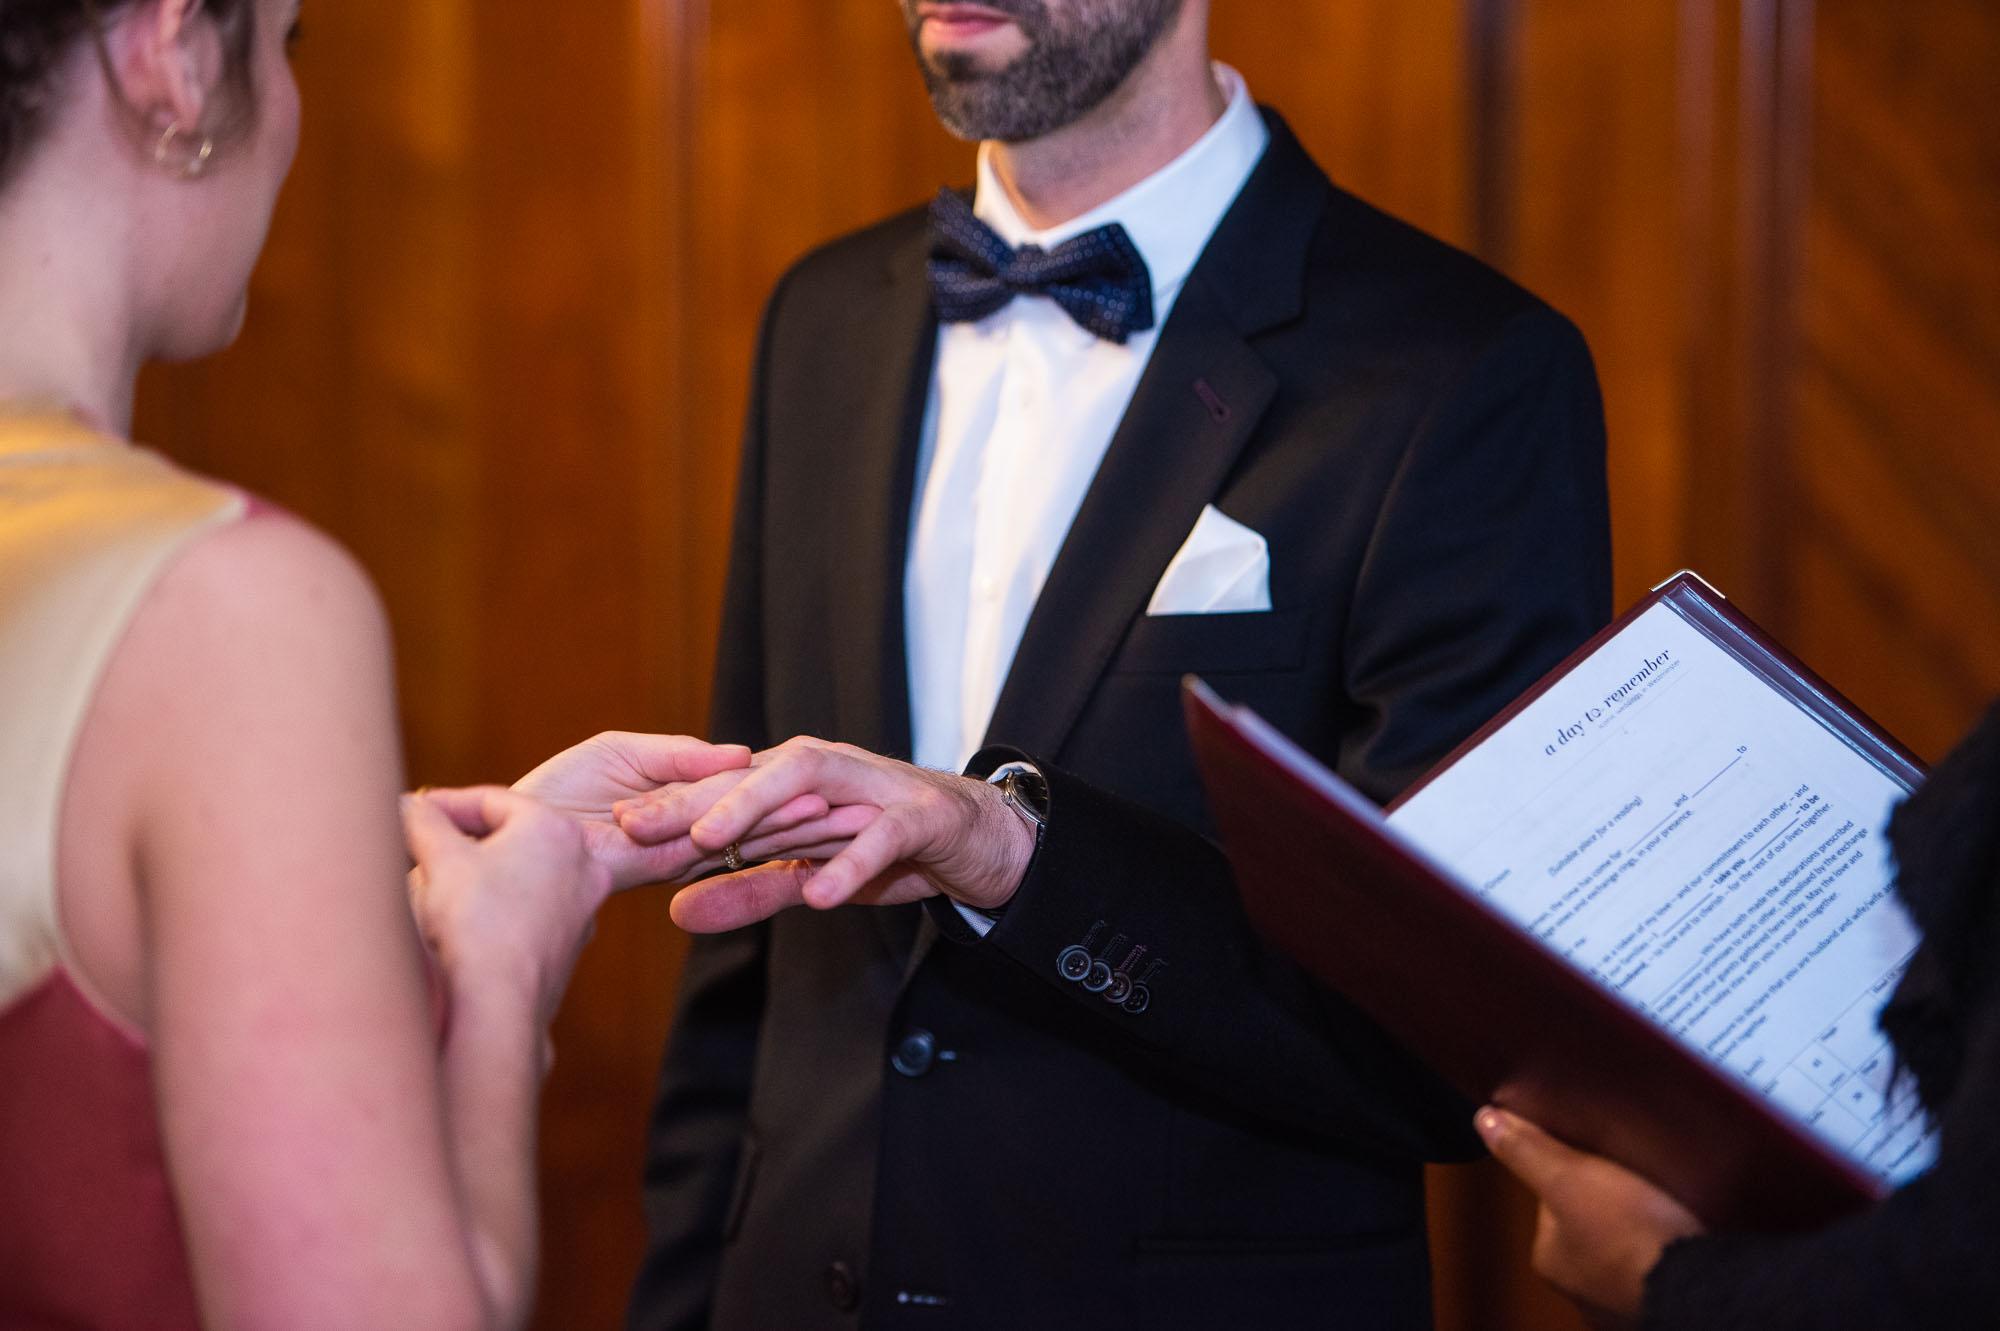 Our Wedding_HR (138 of 176).jpg